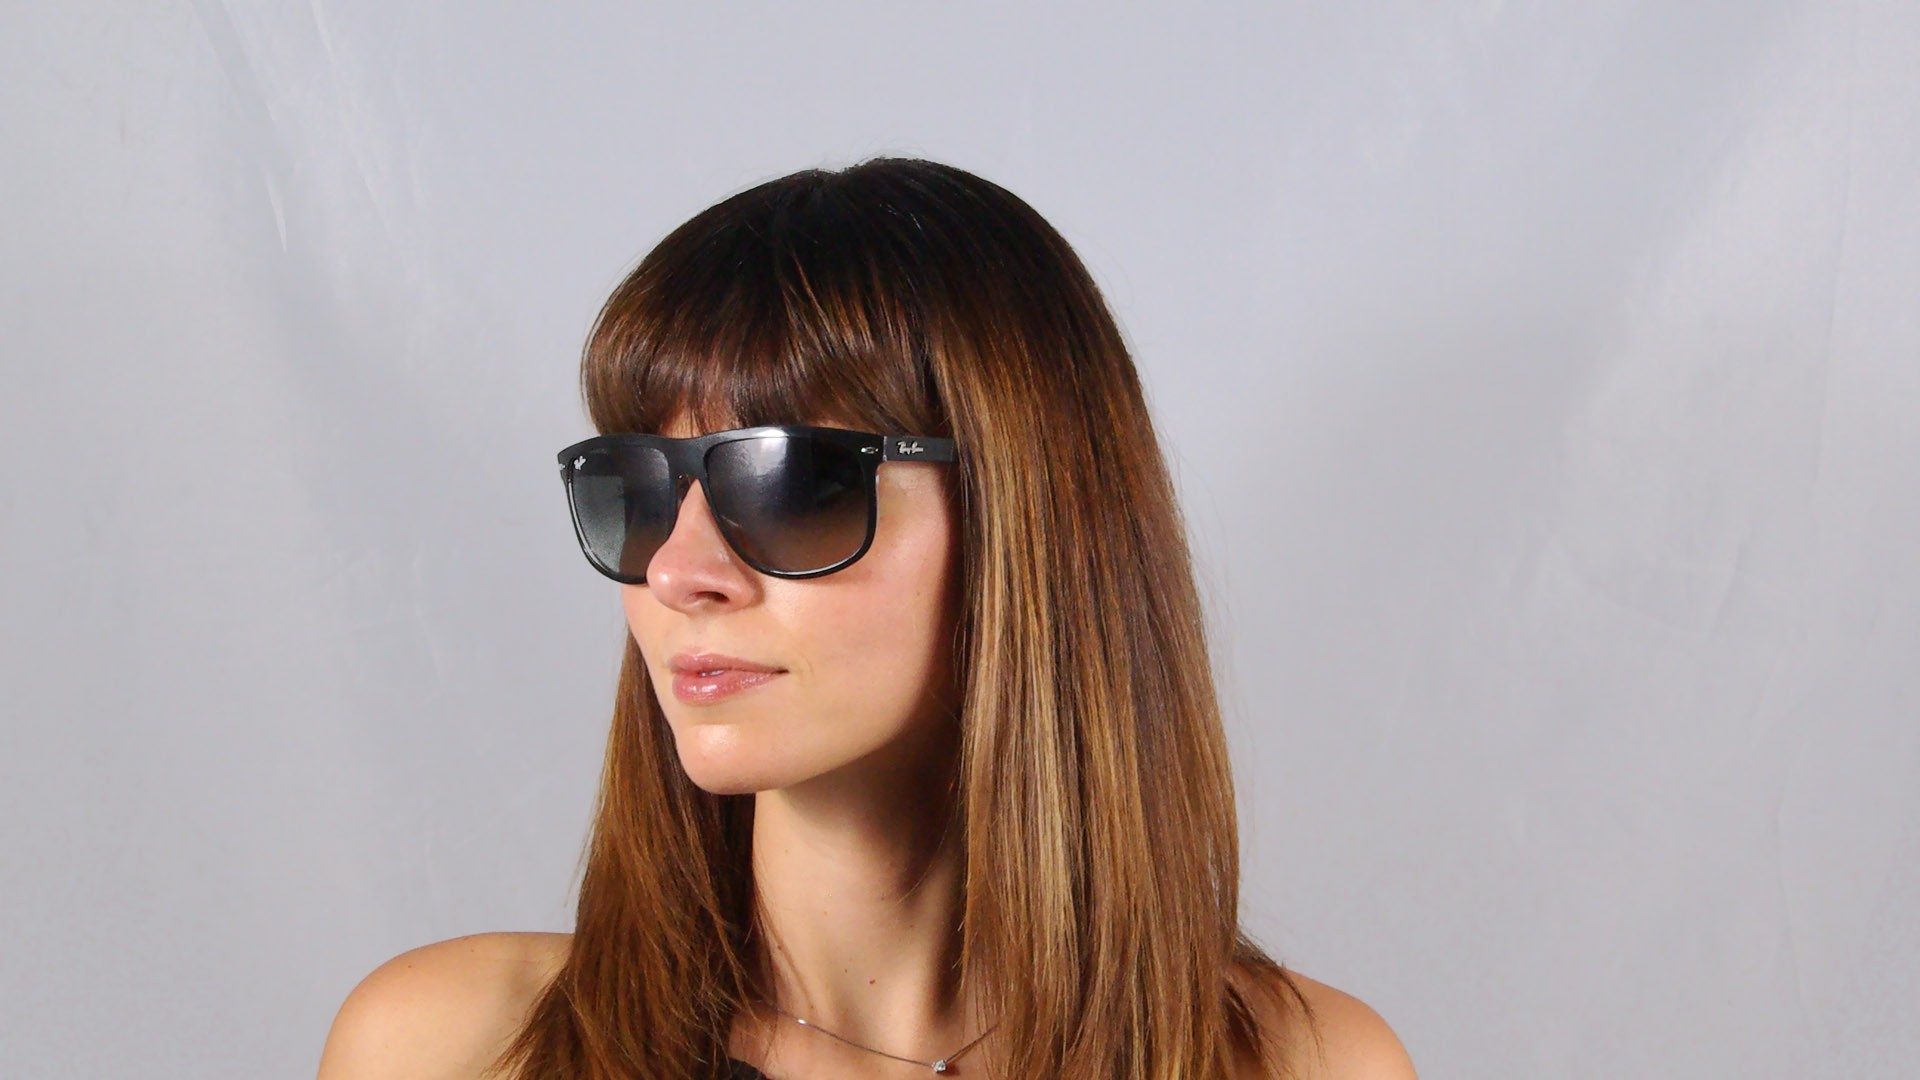 fb0e0530206 Sunglasses Ray-Ban RB4147 6039 71 60-15 Black Large Gradient